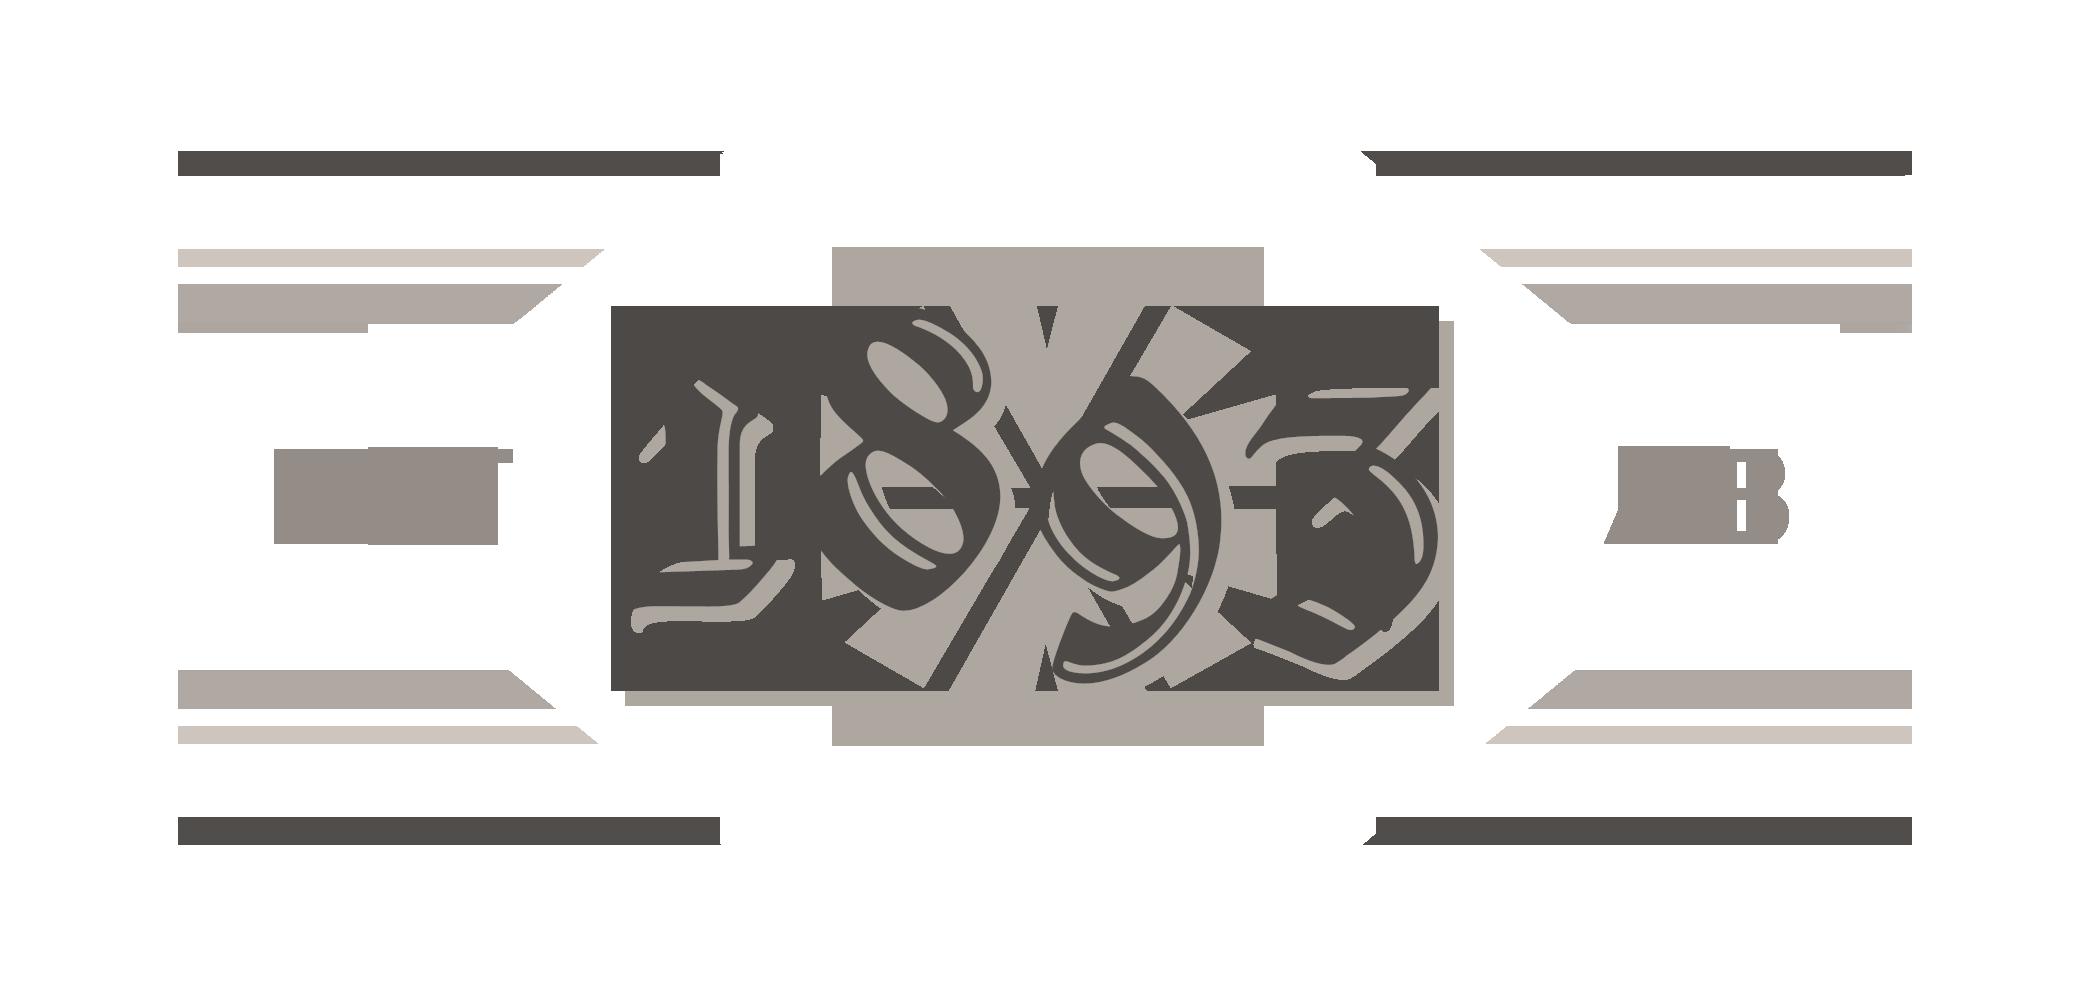 est-1893.jpg